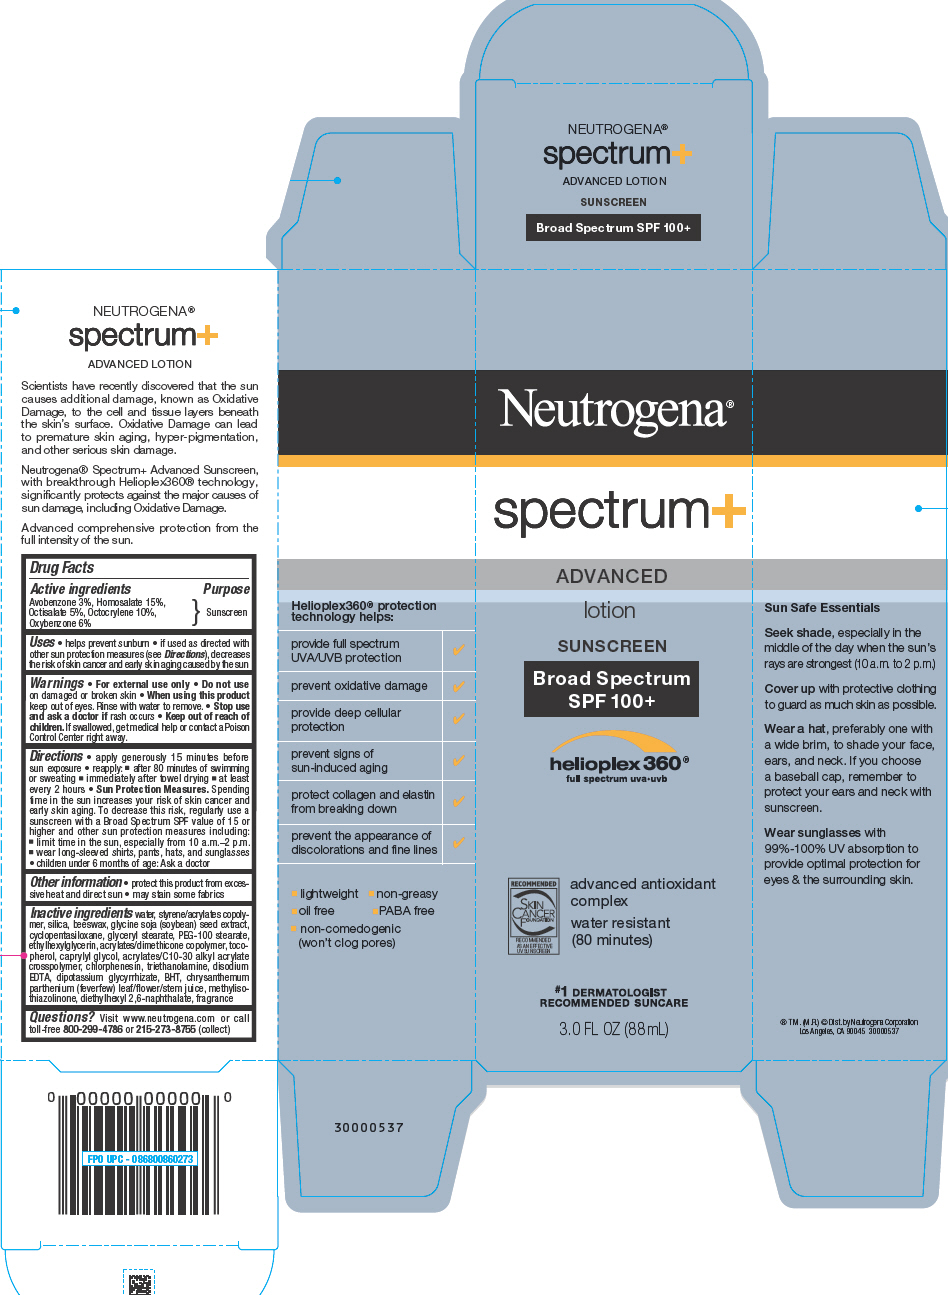 Neutrogena Spectrum Plus Advanced Sunscreen Broad Spectrum Spf100 Plus (Avobenzone, Homosalate, Octisalate, Octocrylene, And Oxybenzone) Lotion [Neutrogena Corporation]